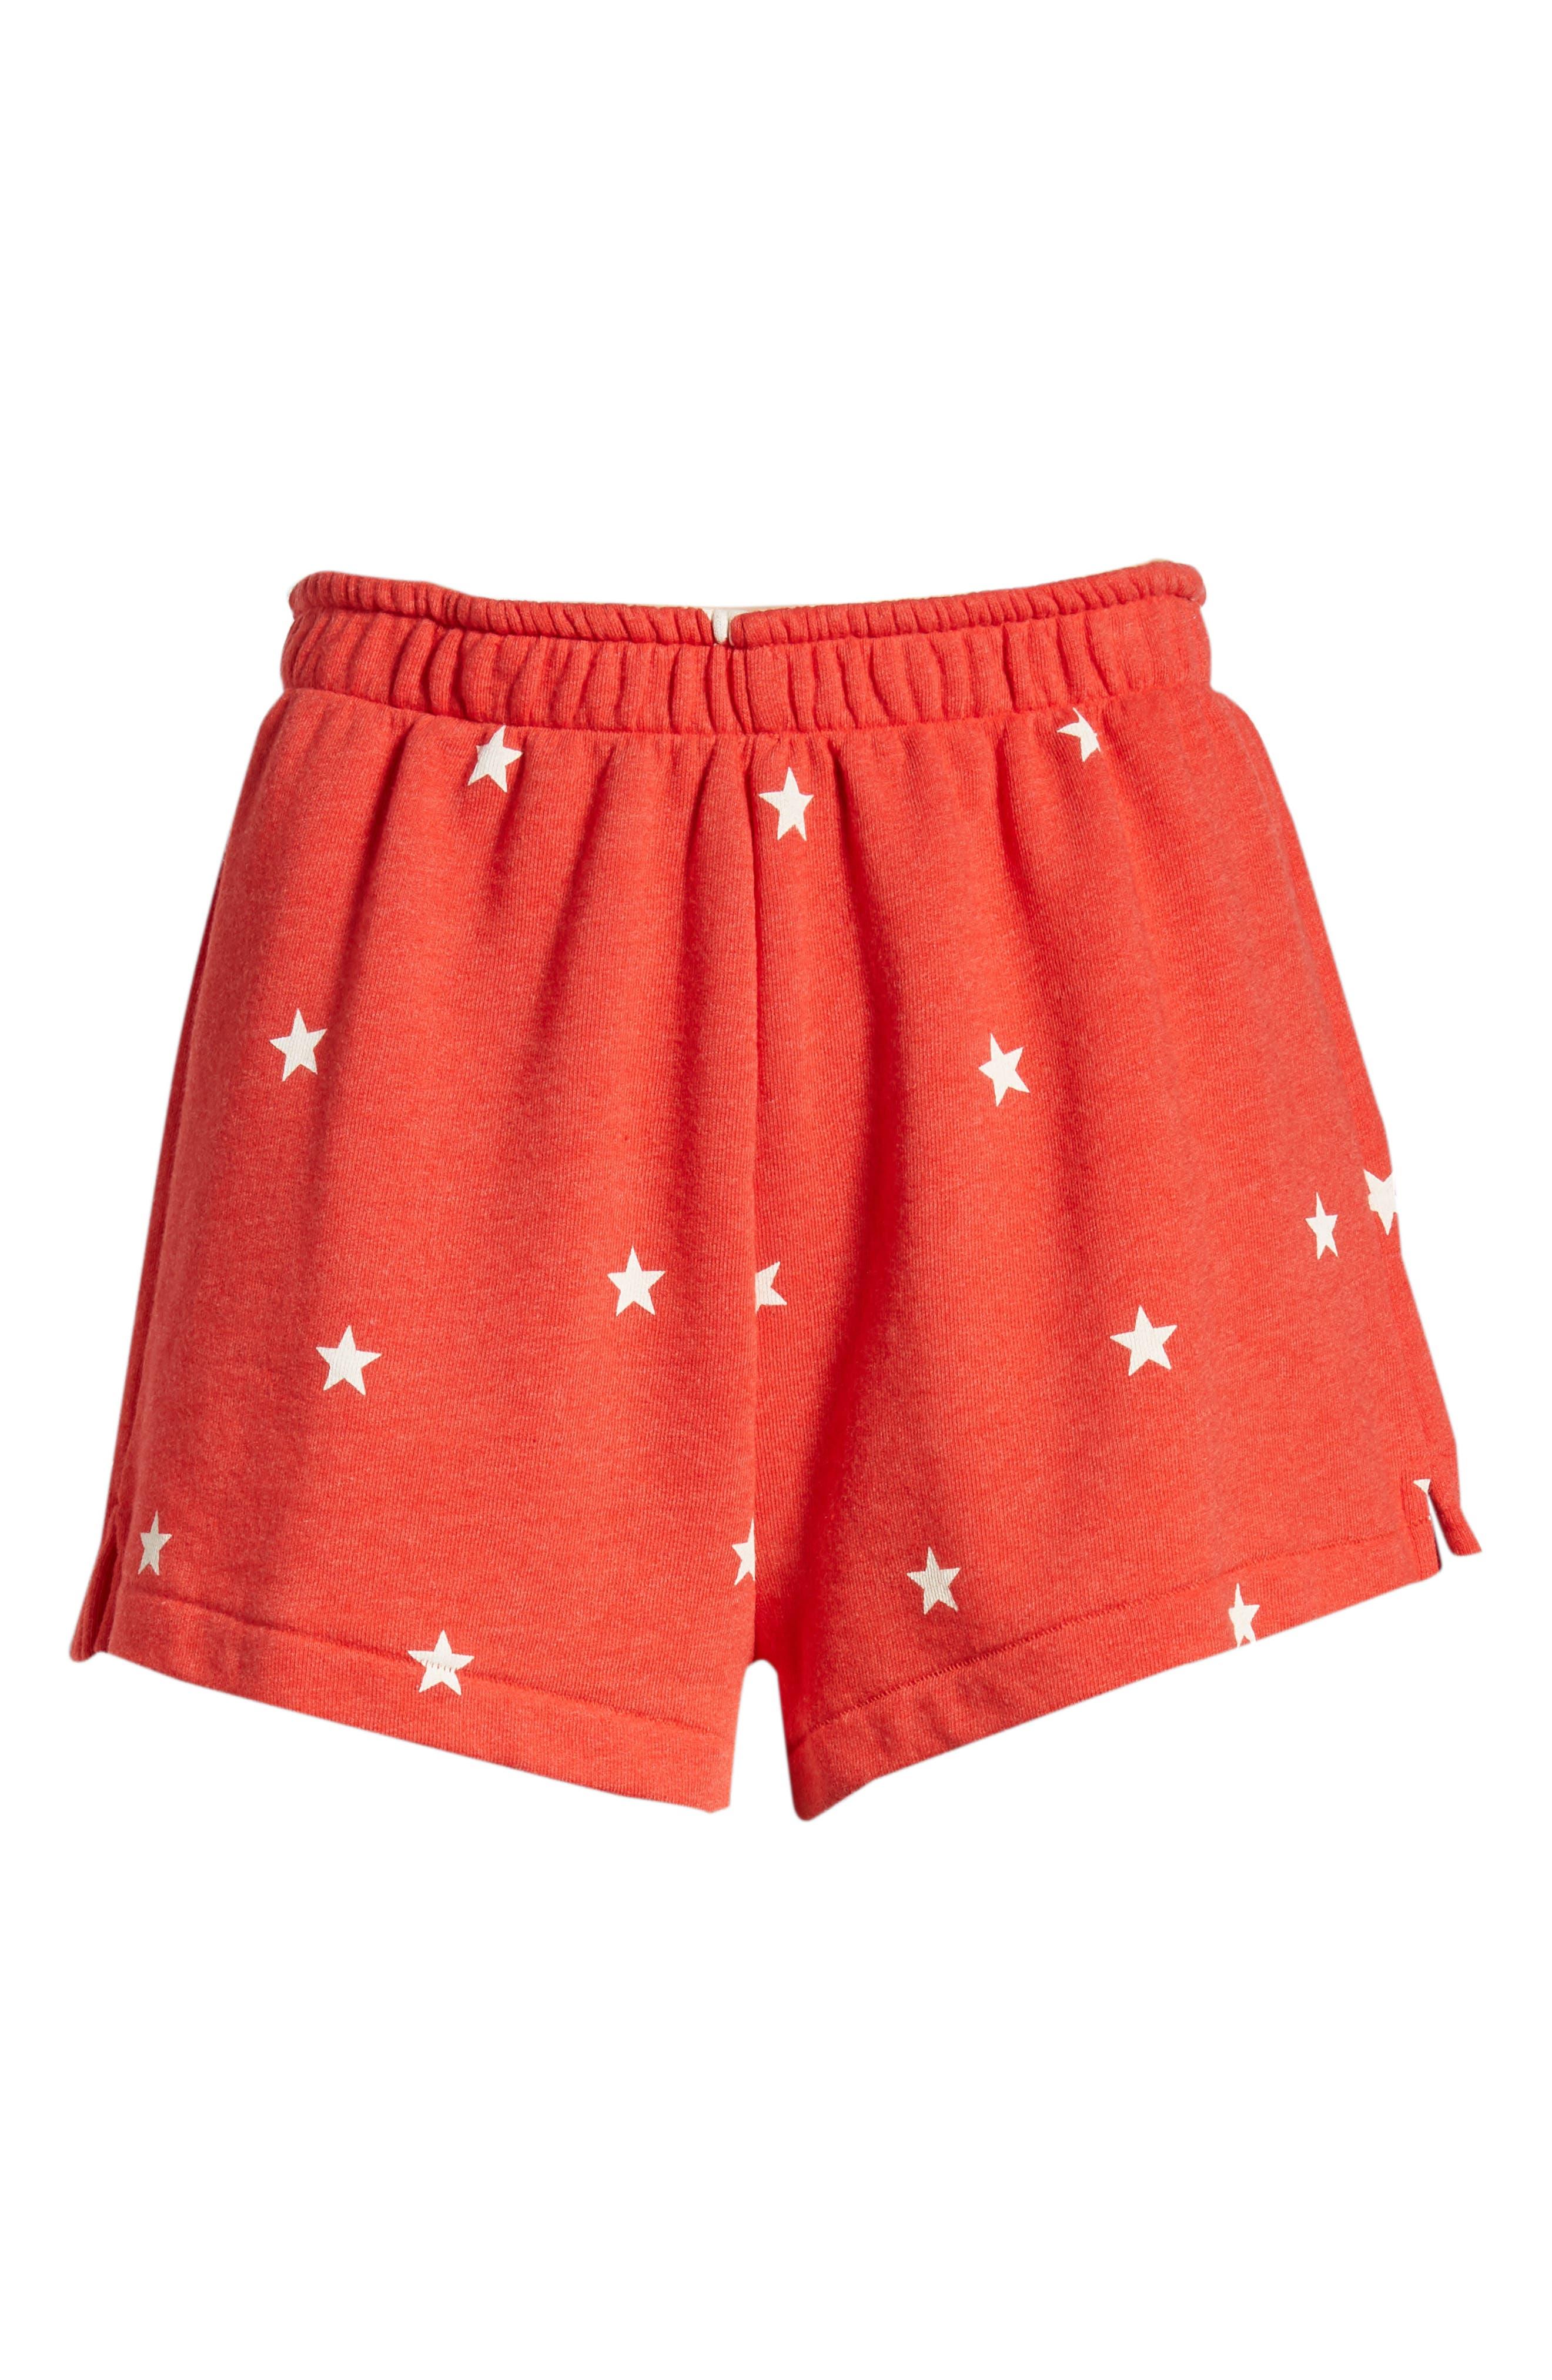 Football Star Golden Shorts,                             Alternate thumbnail 6, color,                             600